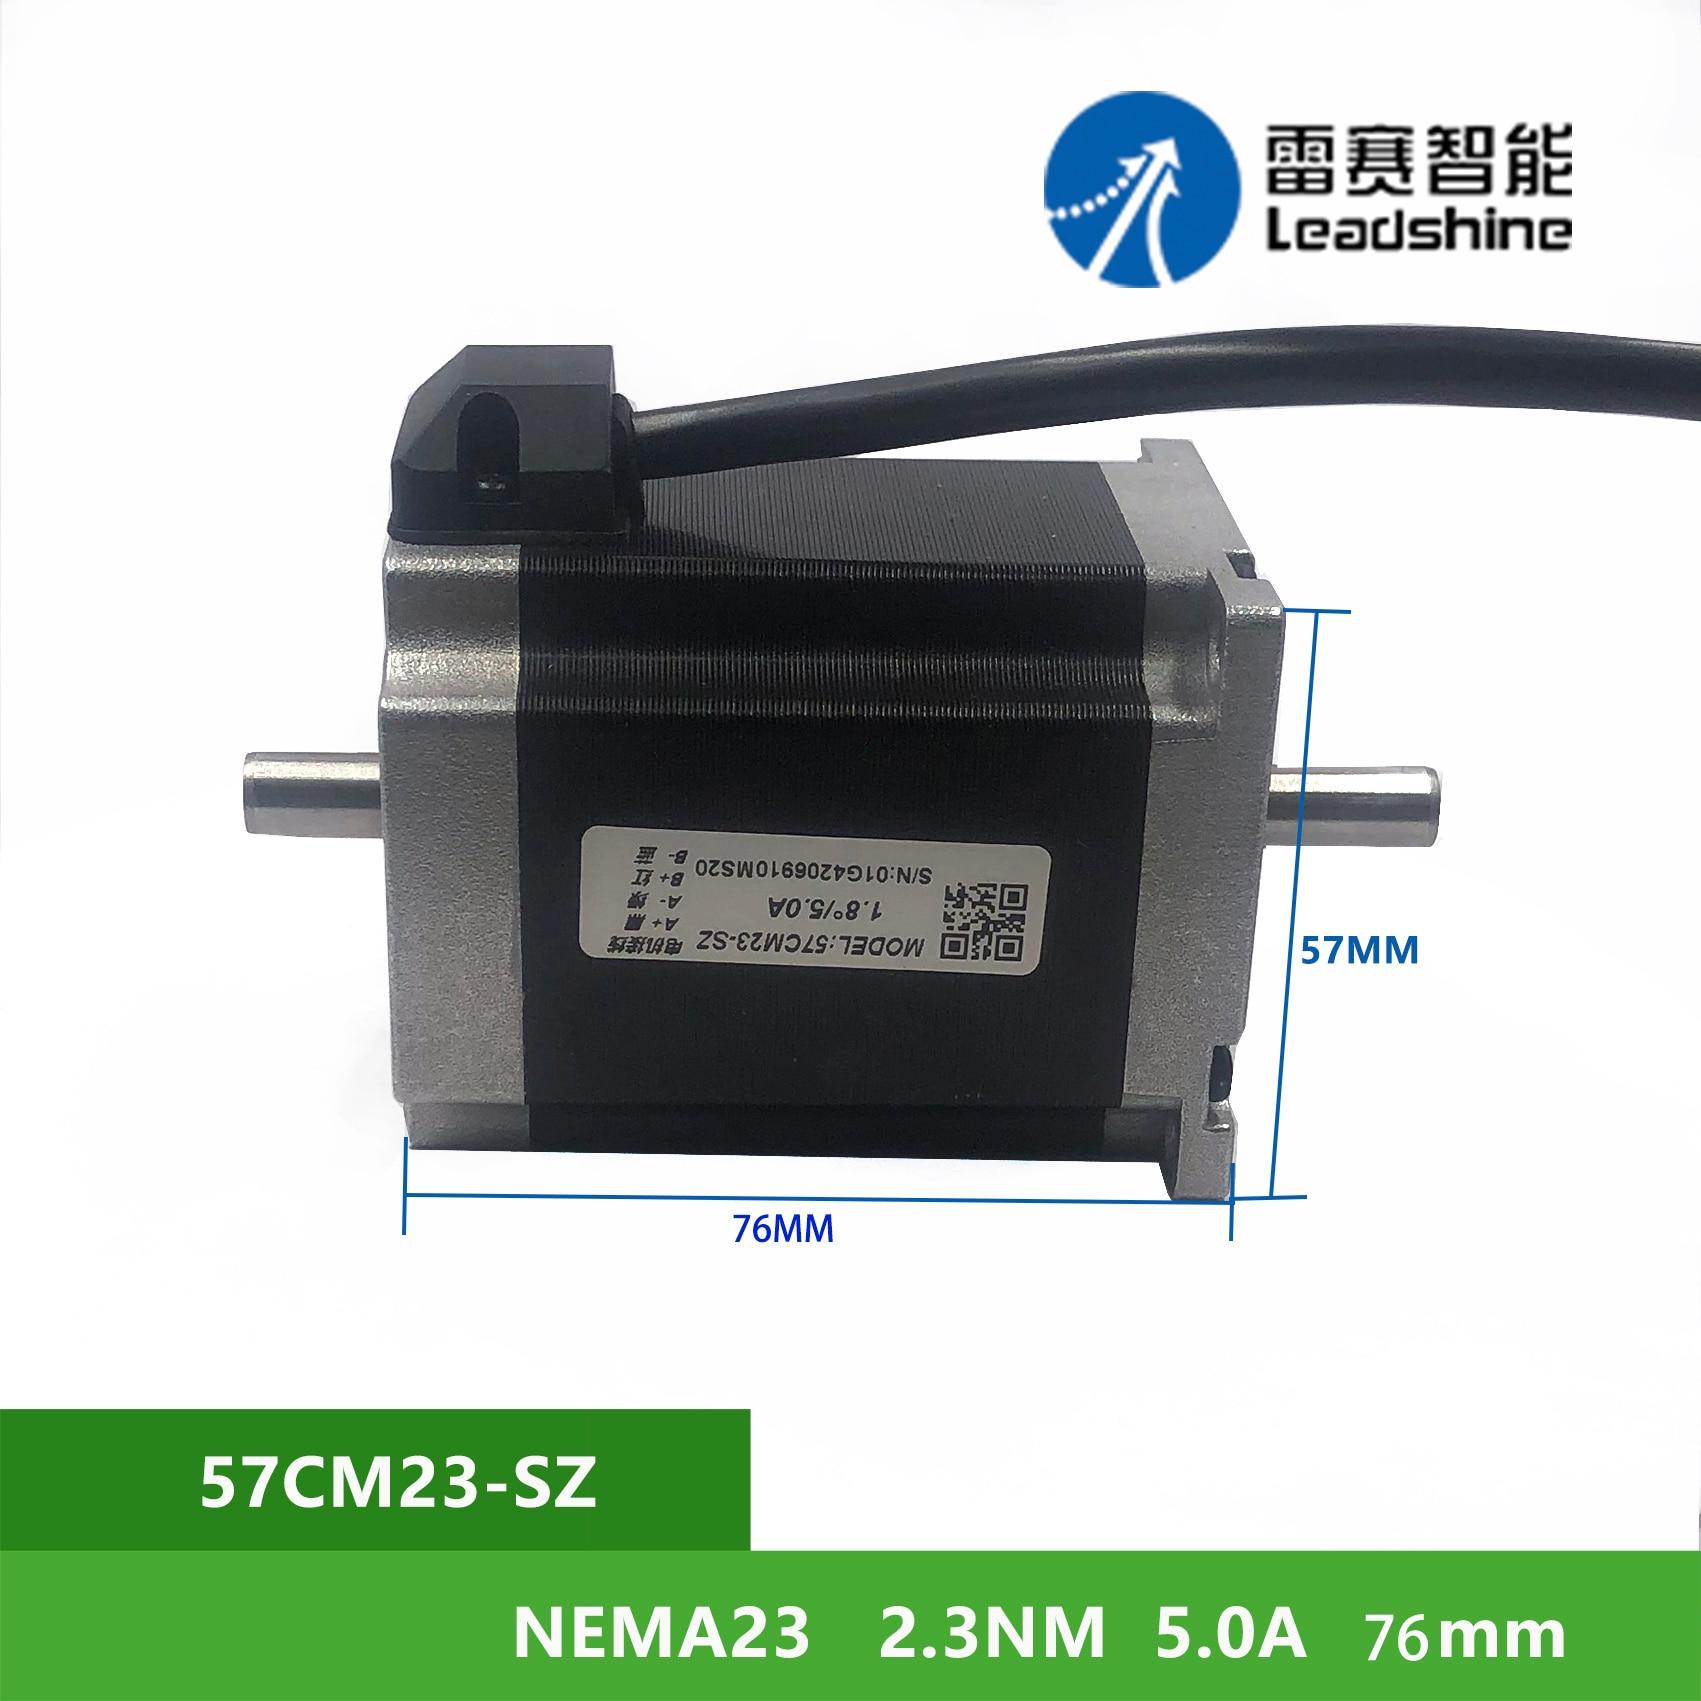 NEMA23 Leadshine 57CM23-SZ 2.3Nm 5A 2 المرحلة السائر موتور رمح القطر 6.35m مزدوجة رمح